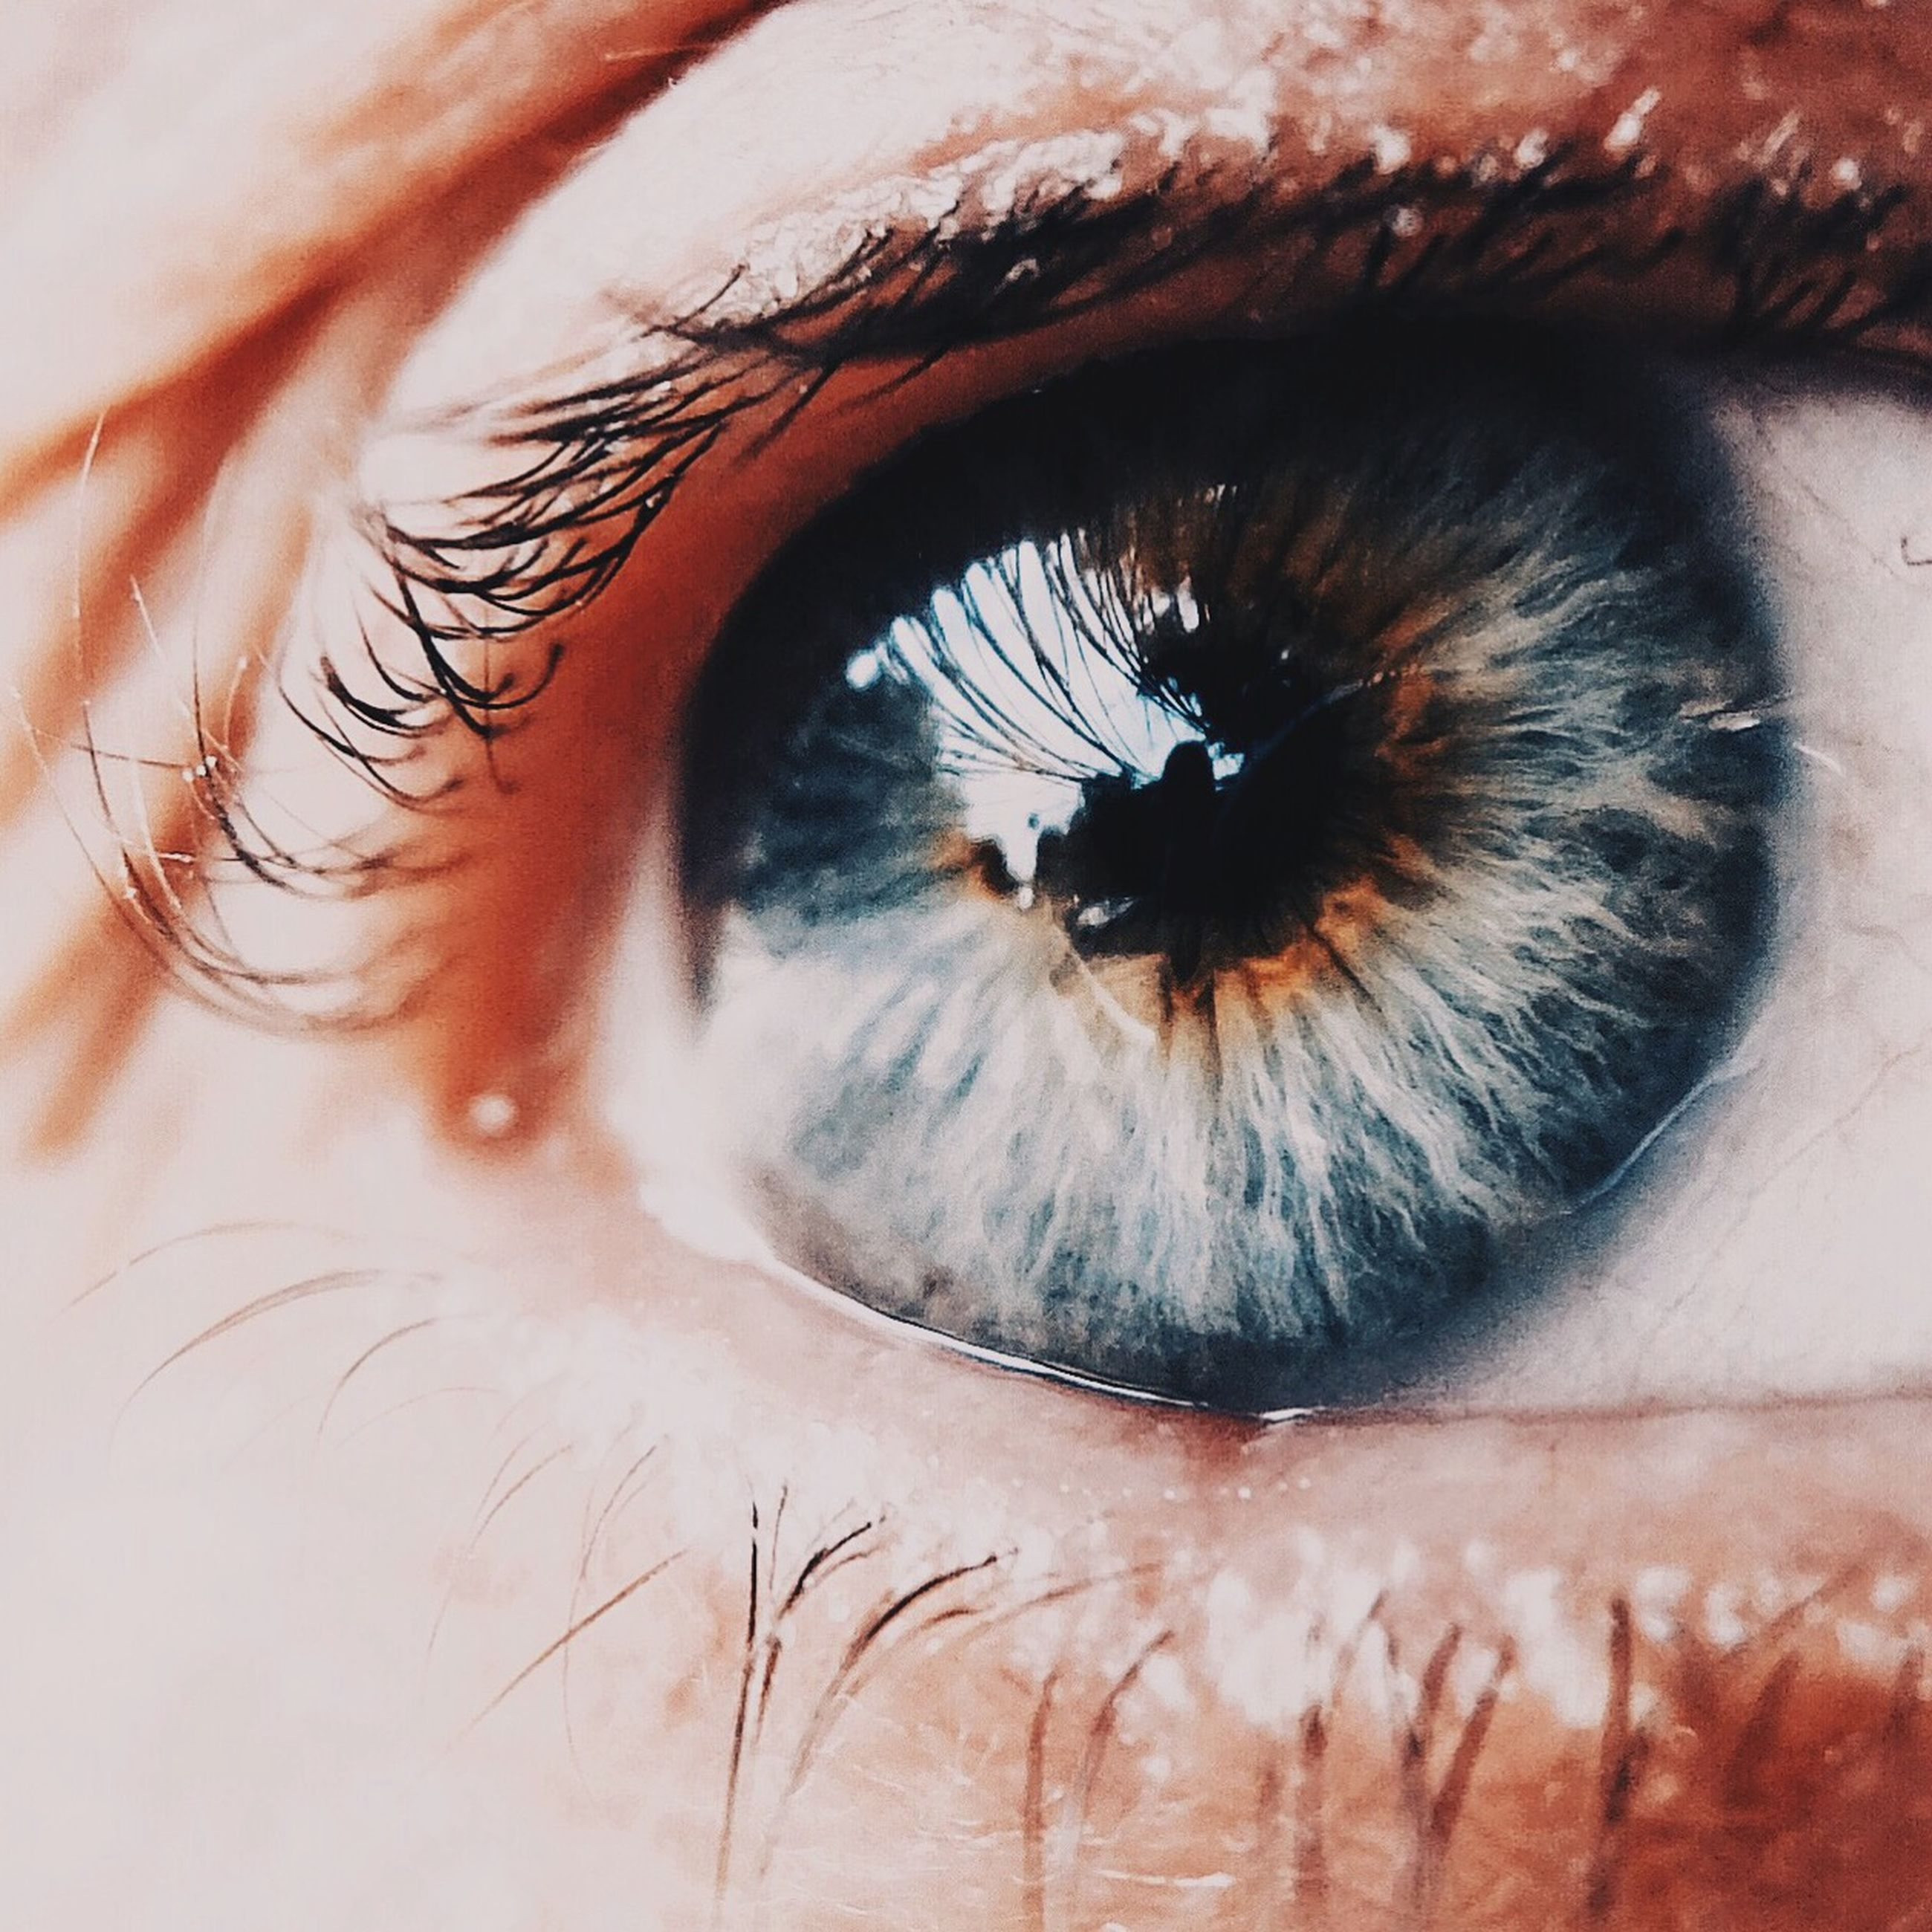 human eye, eyelash, close-up, eyesight, part of, sensory perception, looking at camera, human skin, portrait, extreme close-up, eyeball, human face, iris - eye, extreme close up, eyebrow, vision, lifestyles